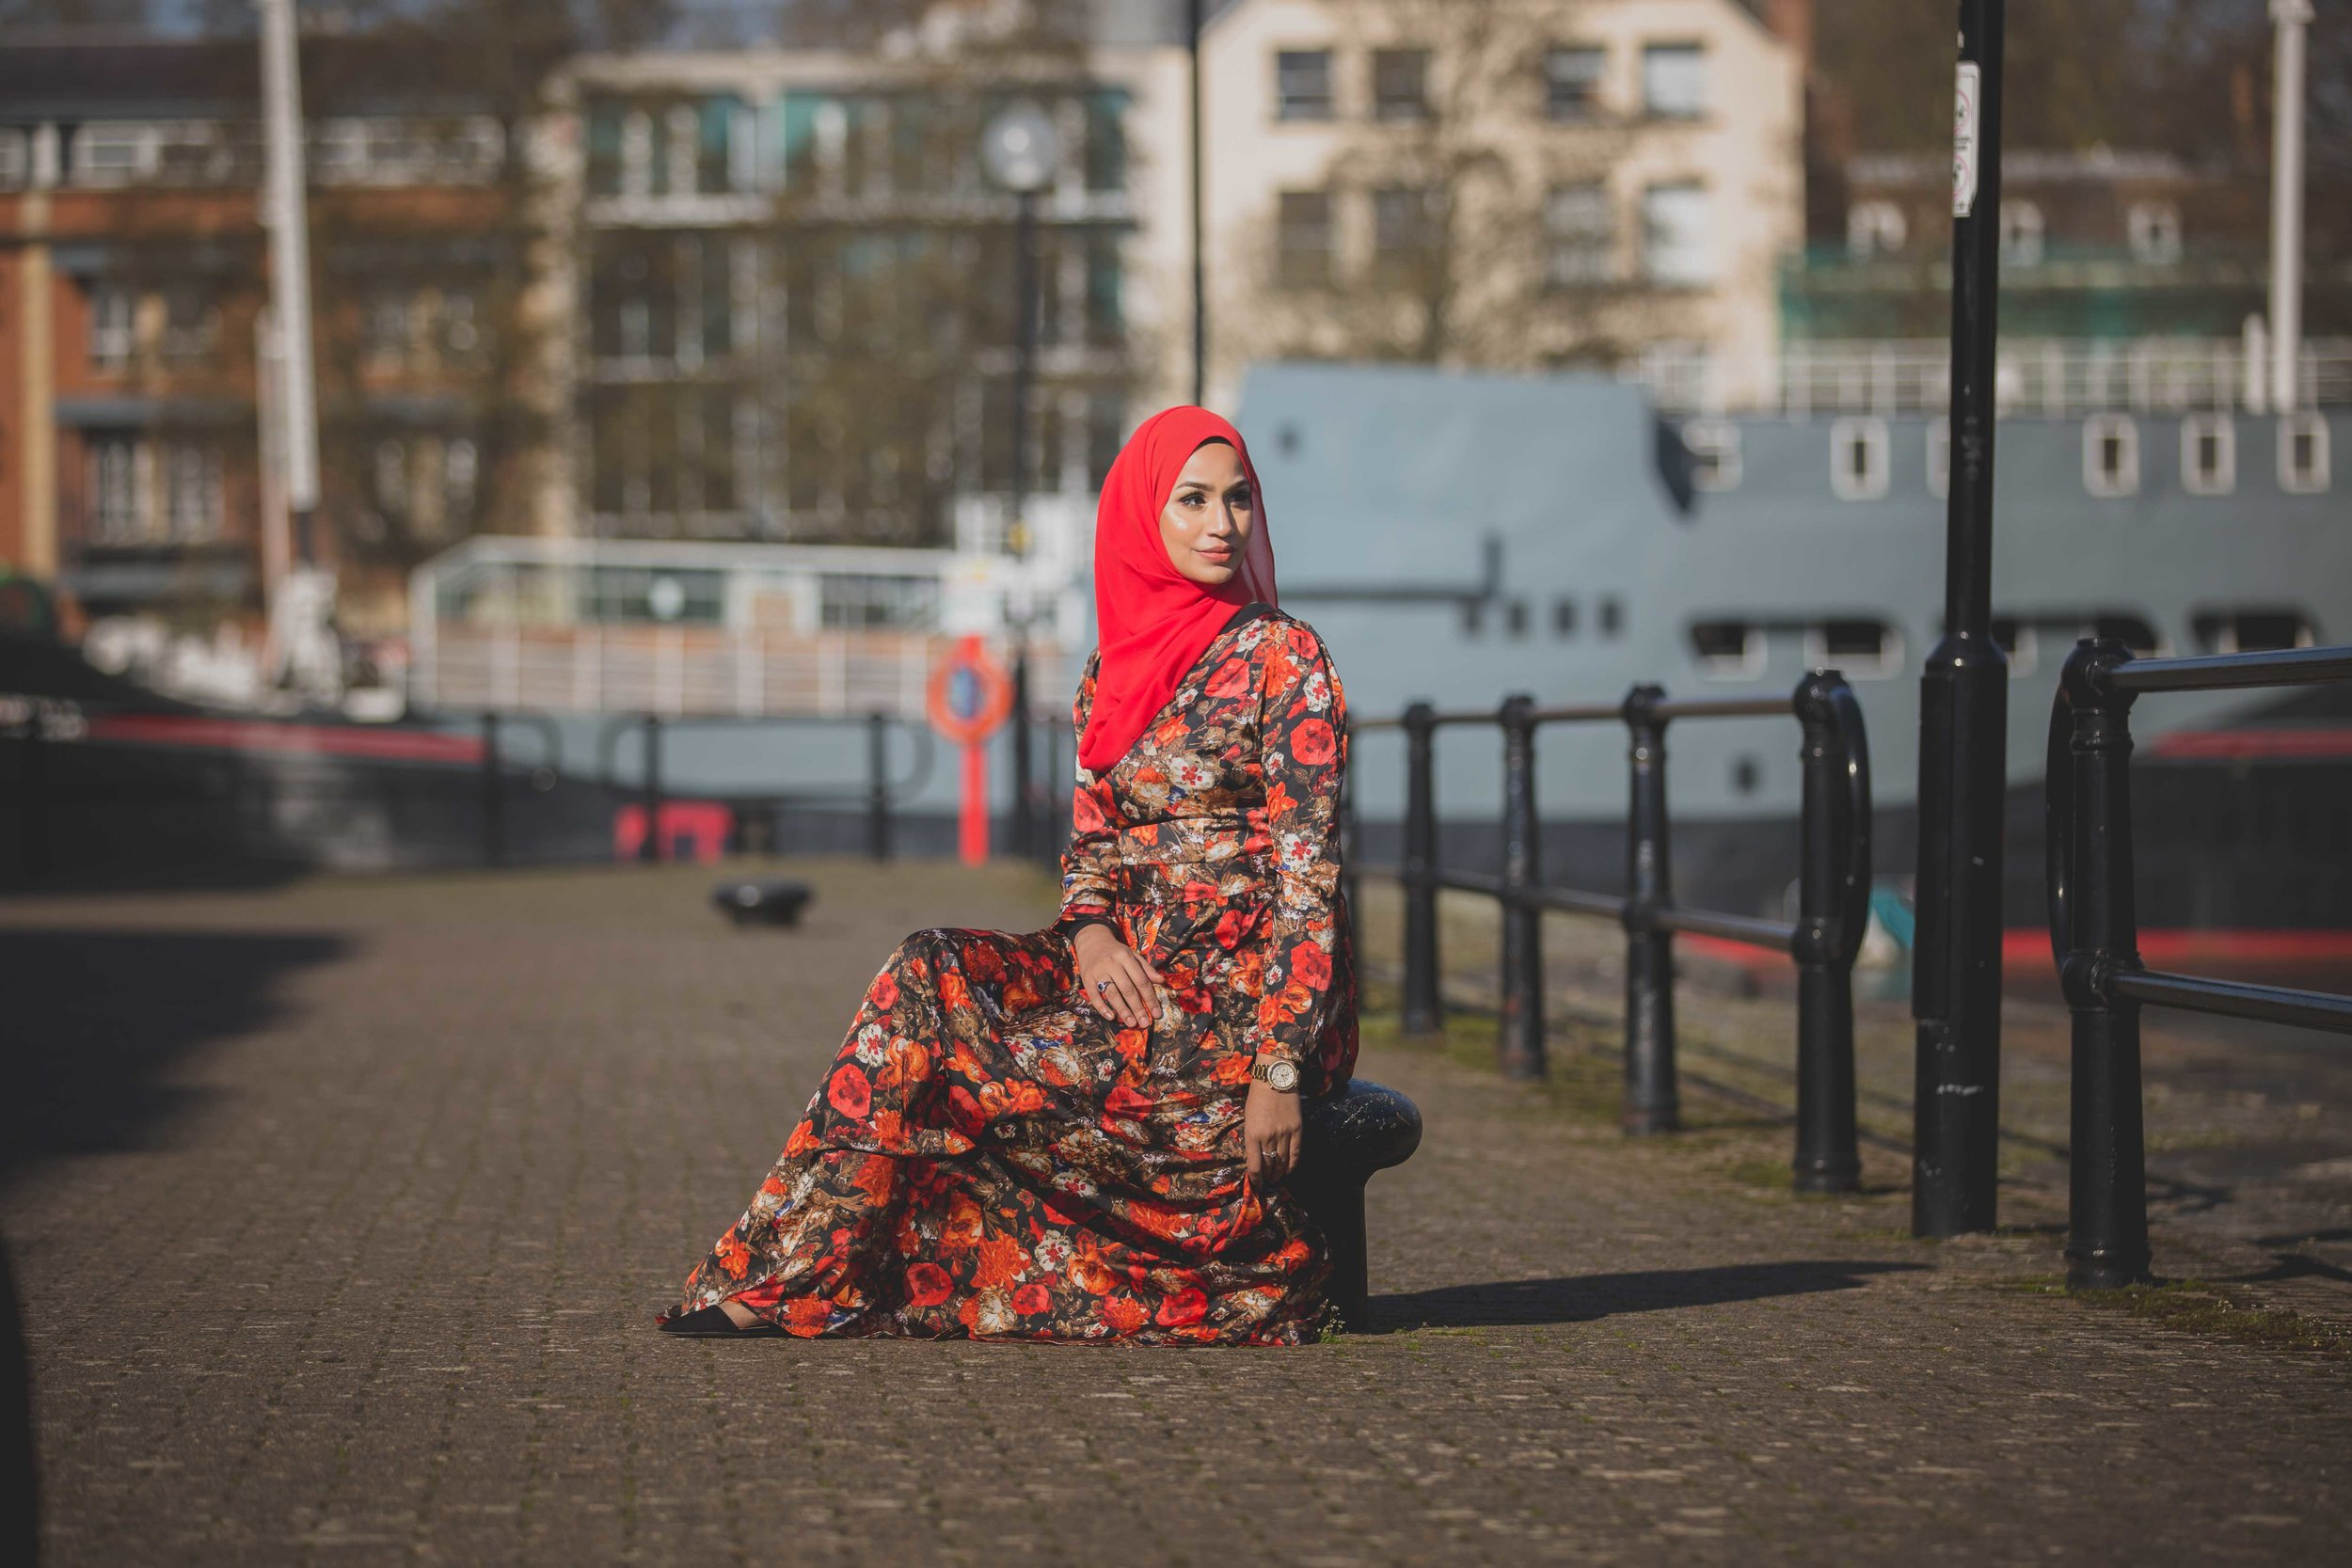 modest-street-aisha-rahman-fashion-photography-london-bristol-natalia-smith-photography-11.jpg